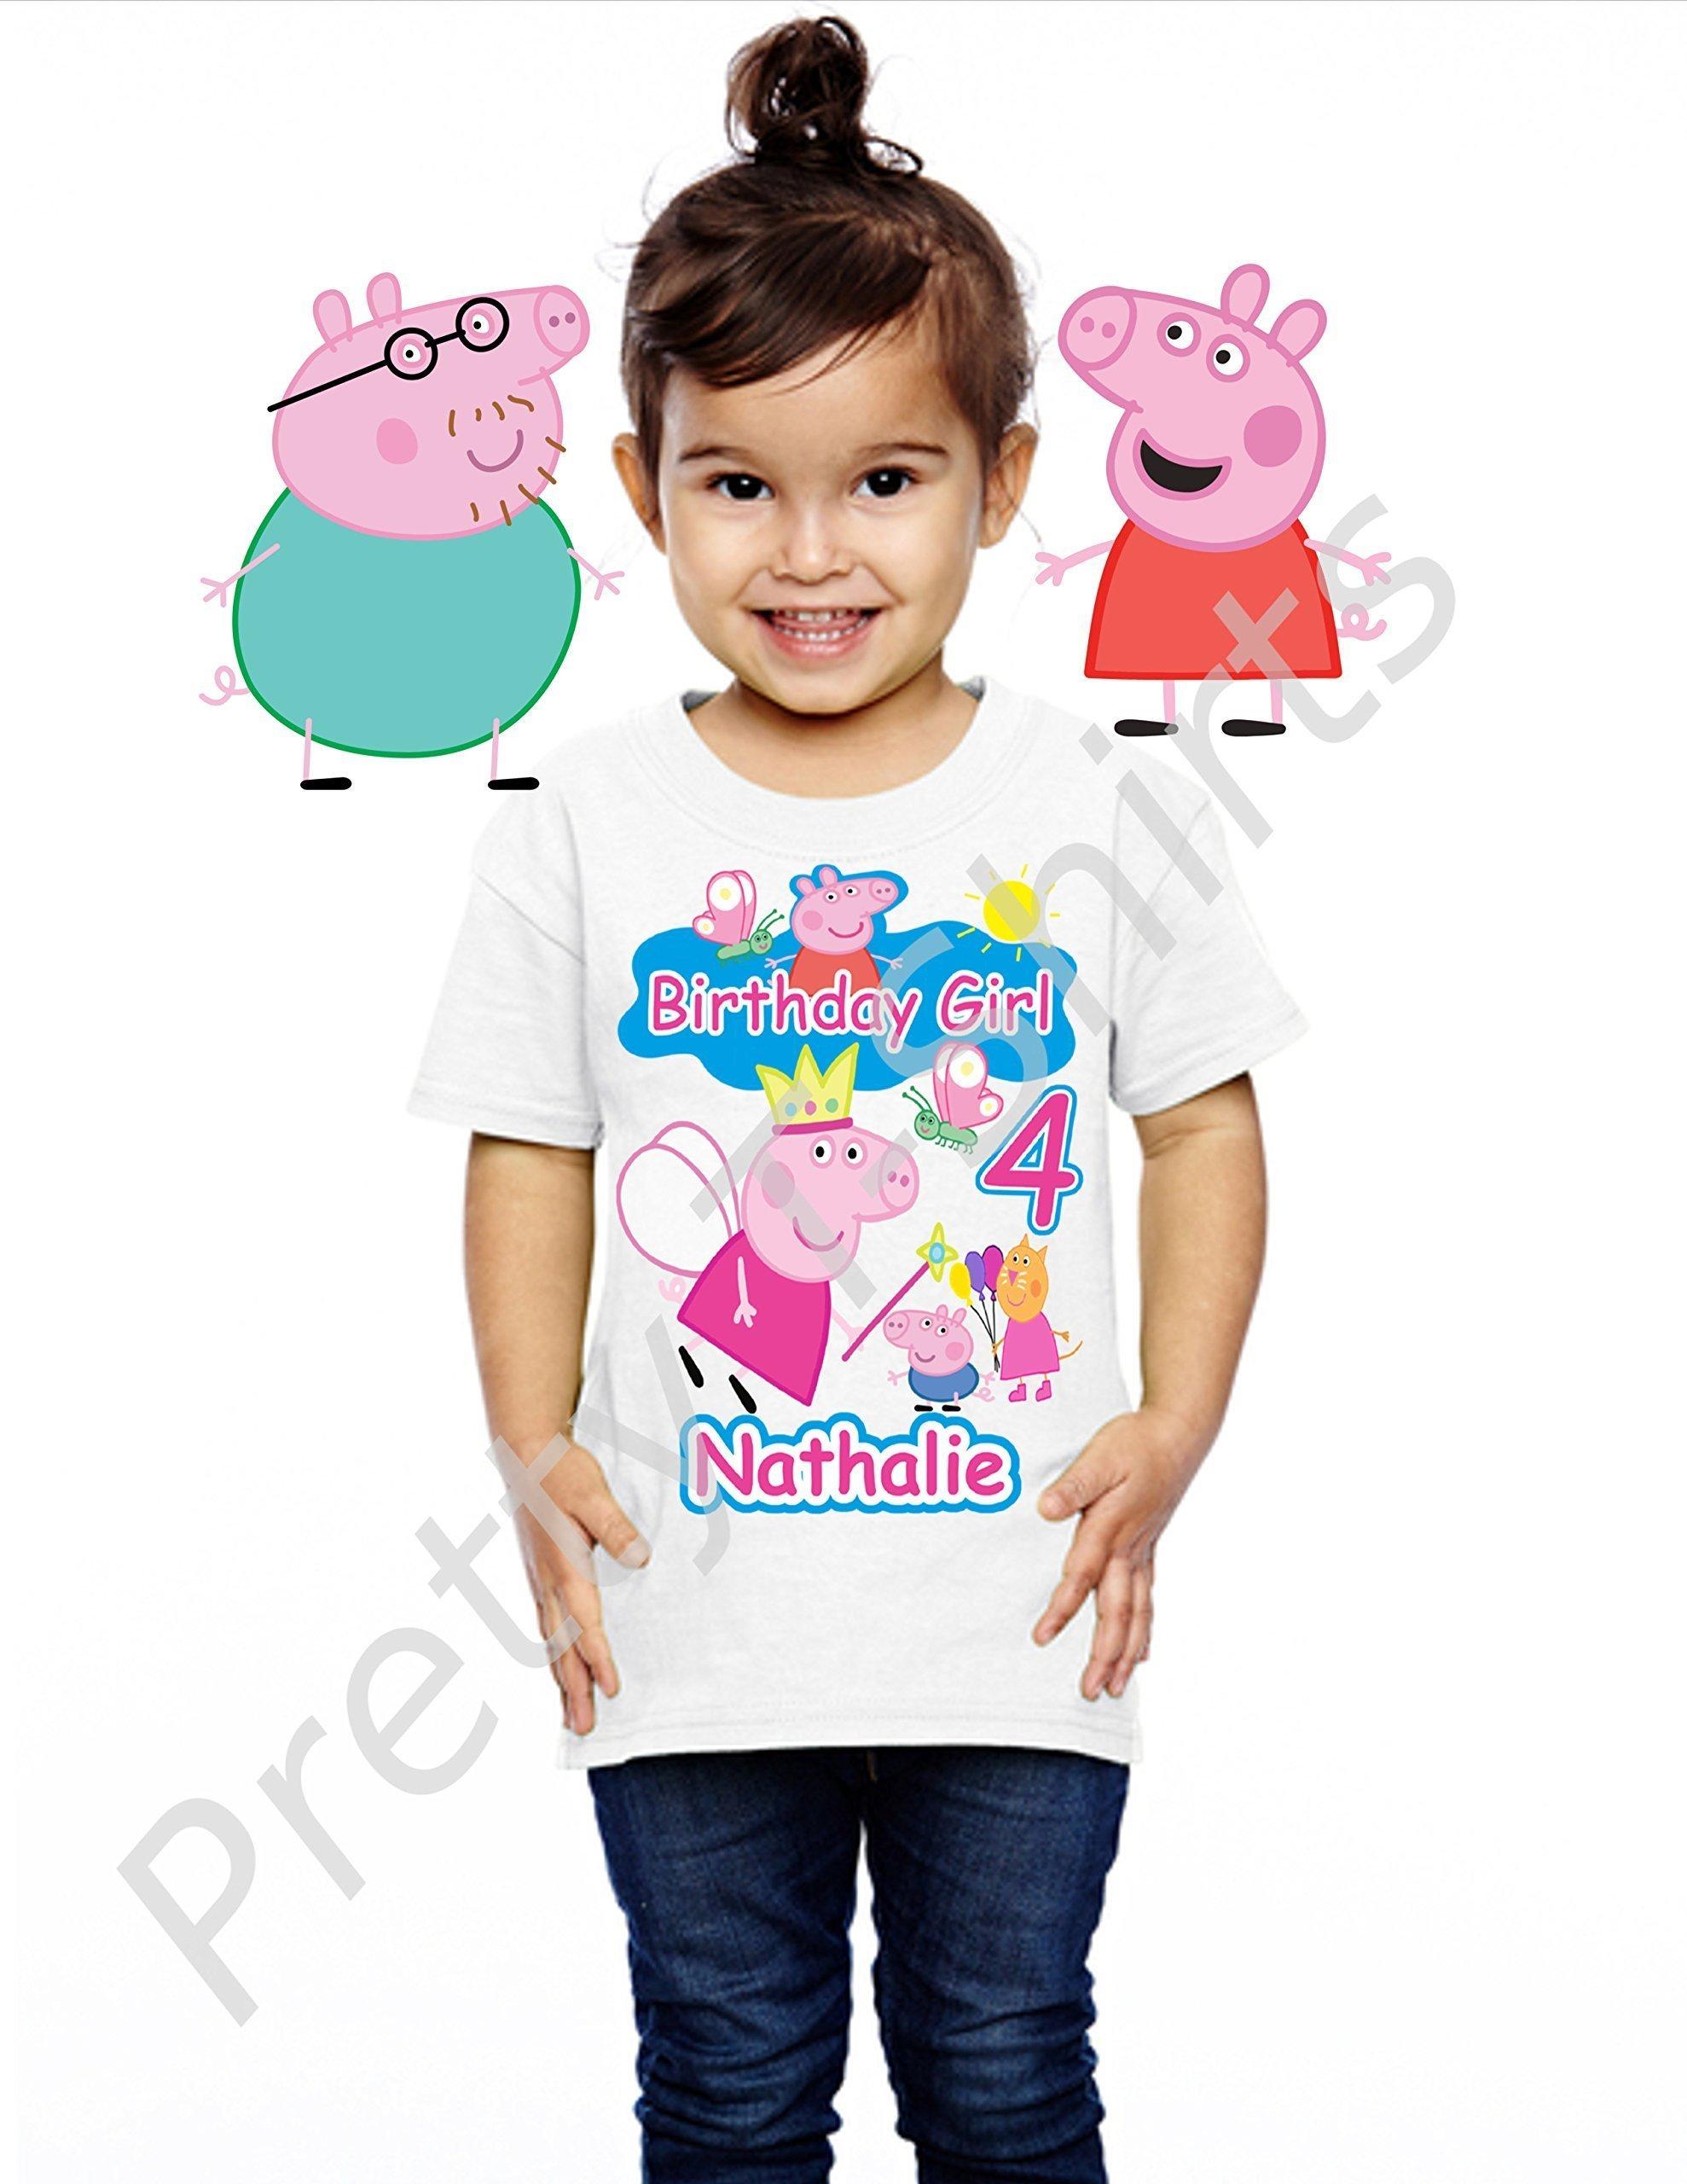 Peppa Pig Birthday Shirt, ADD any name and ANY age, Girl Birthday Shirt, FAMILY Matching Birthday Shirts, Birthday Shirts, Peppa Birthday Shirt, Peppa Shirt, Peppa Pig, VISIT OUR SHOP!!,